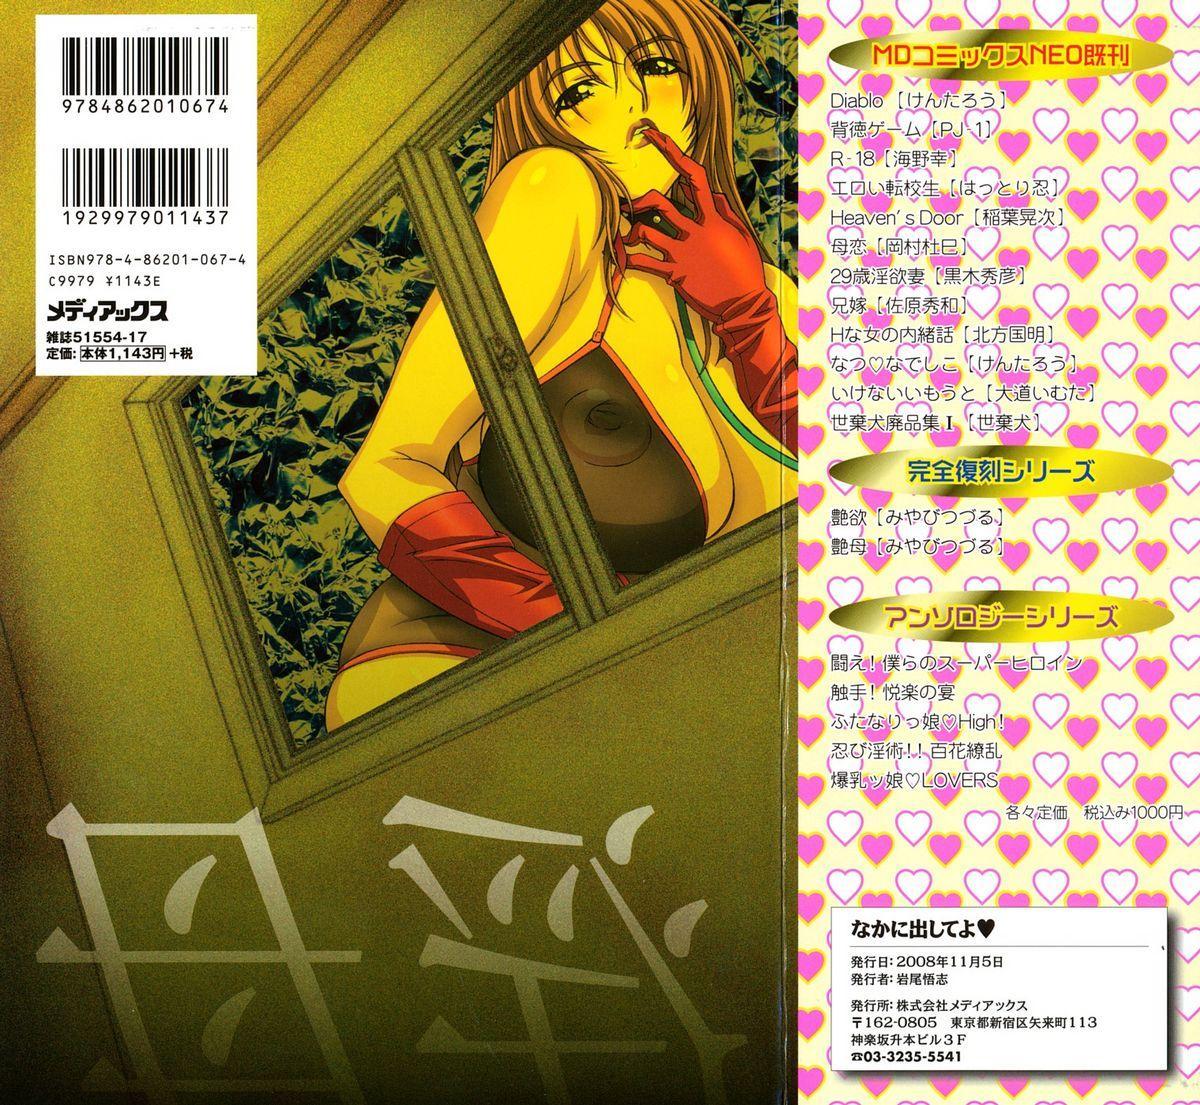 Geki Yaba Anthology Vol. 1 - Naka ni Dashite yo 251